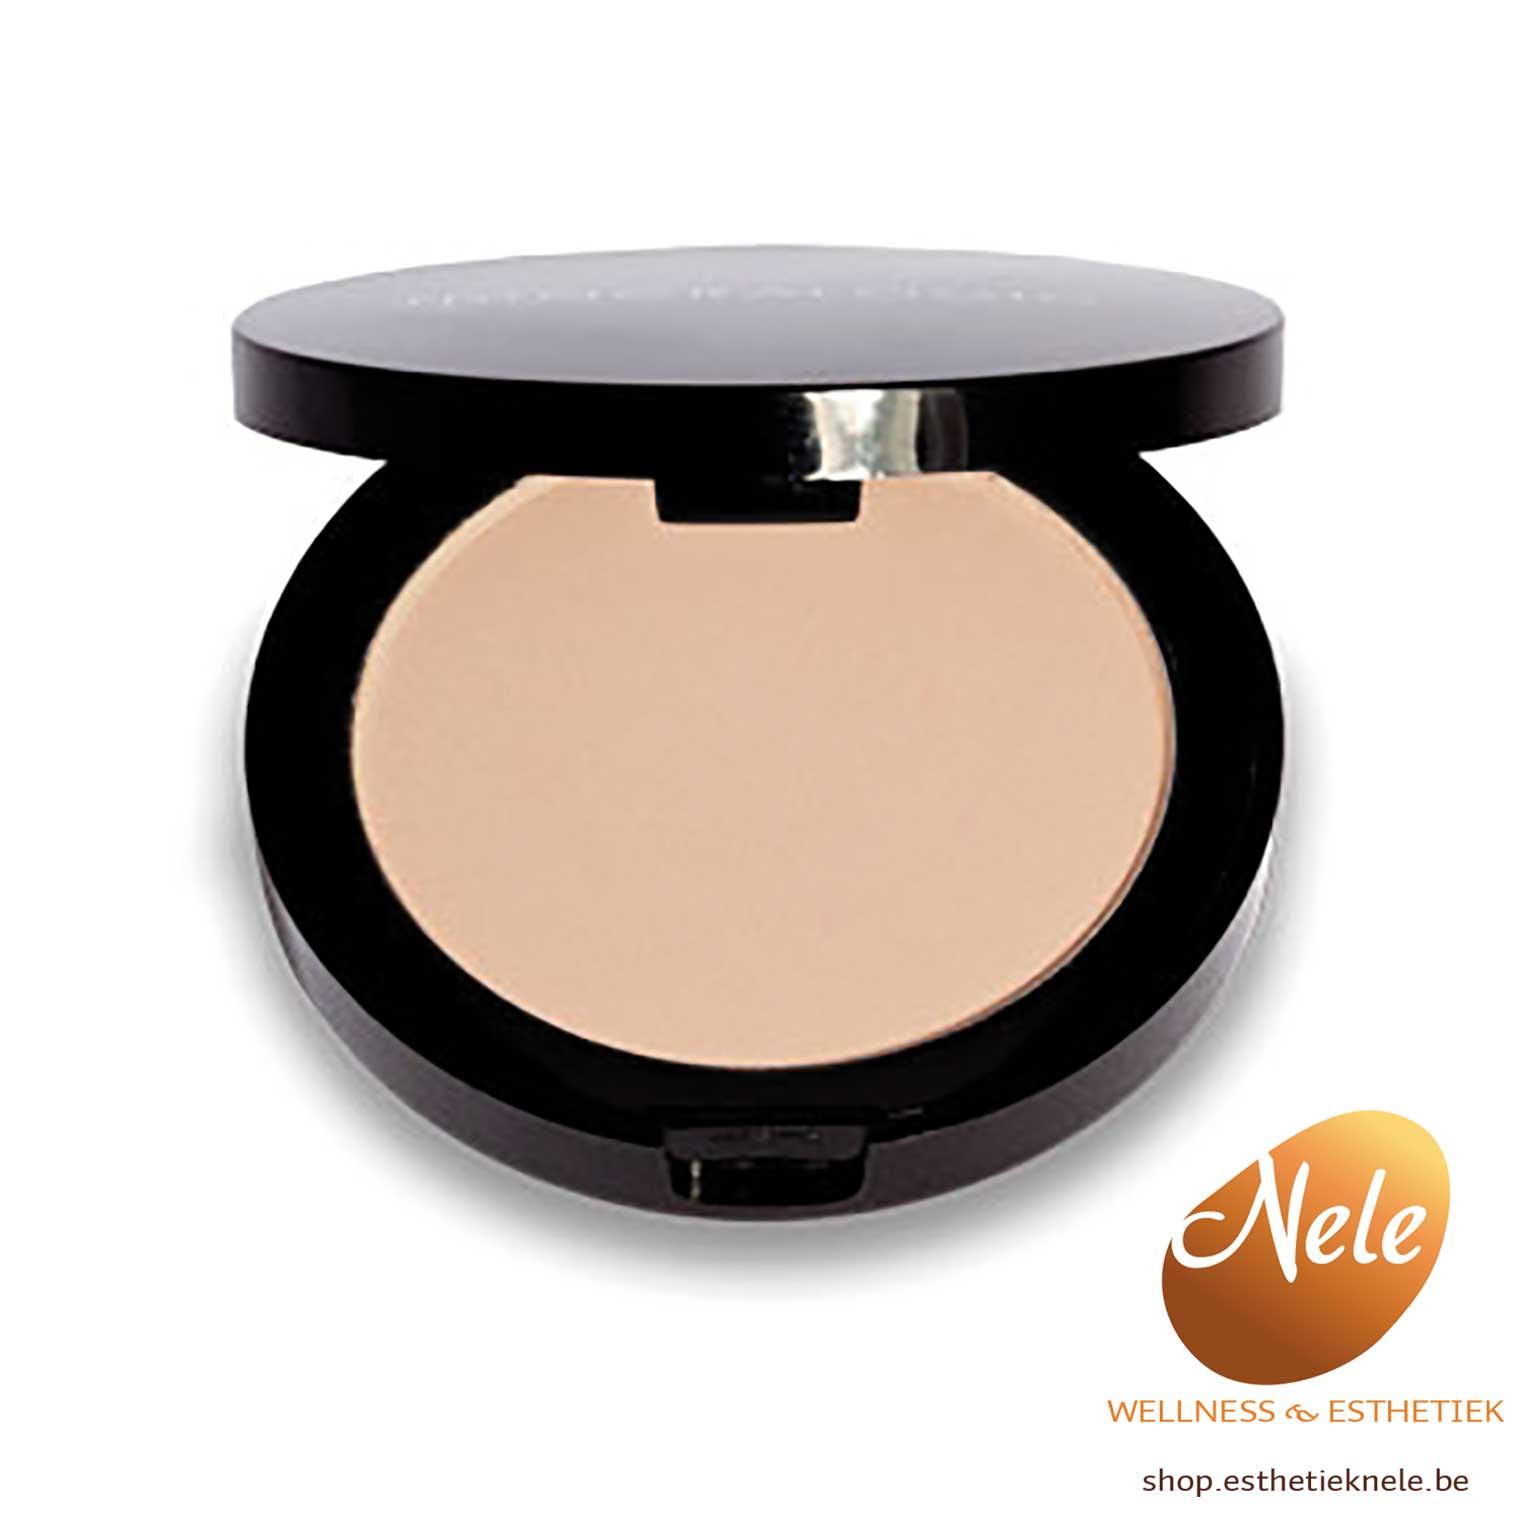 Mineralogie Minerale Make-up Compacte foundation Agate Wellness Esthetiek Nele